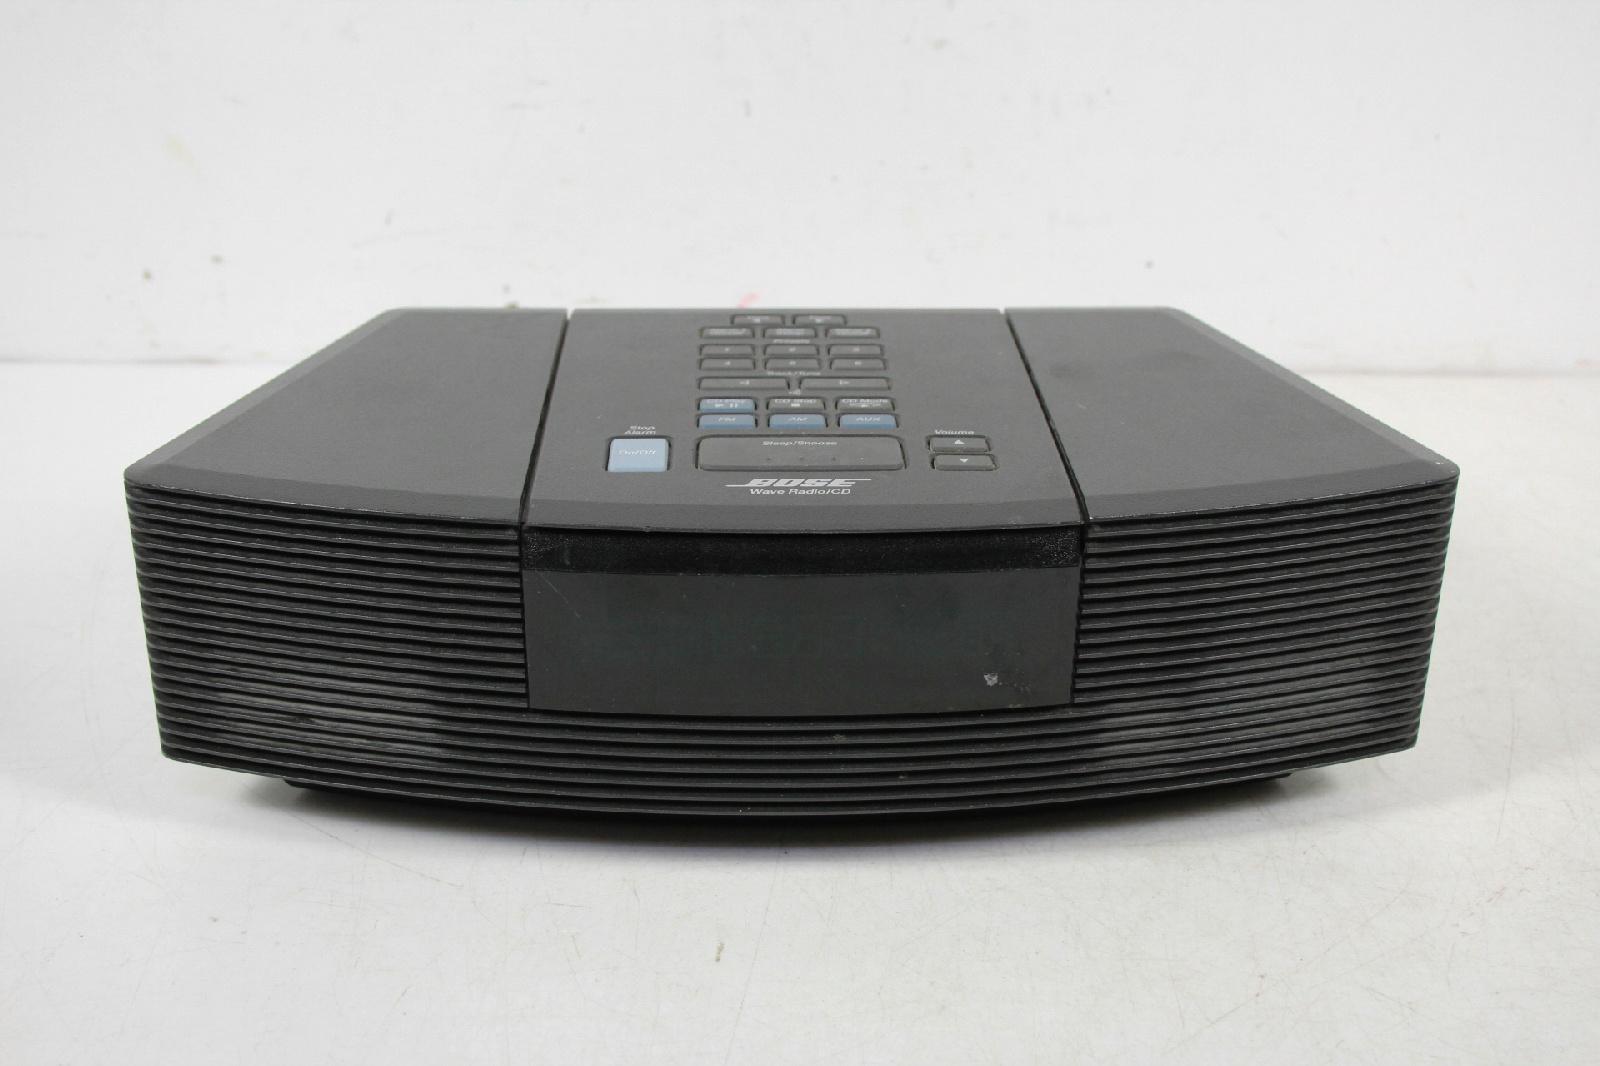 bose awrc 1g am fm wave radio cd player alarm clock ebay. Black Bedroom Furniture Sets. Home Design Ideas